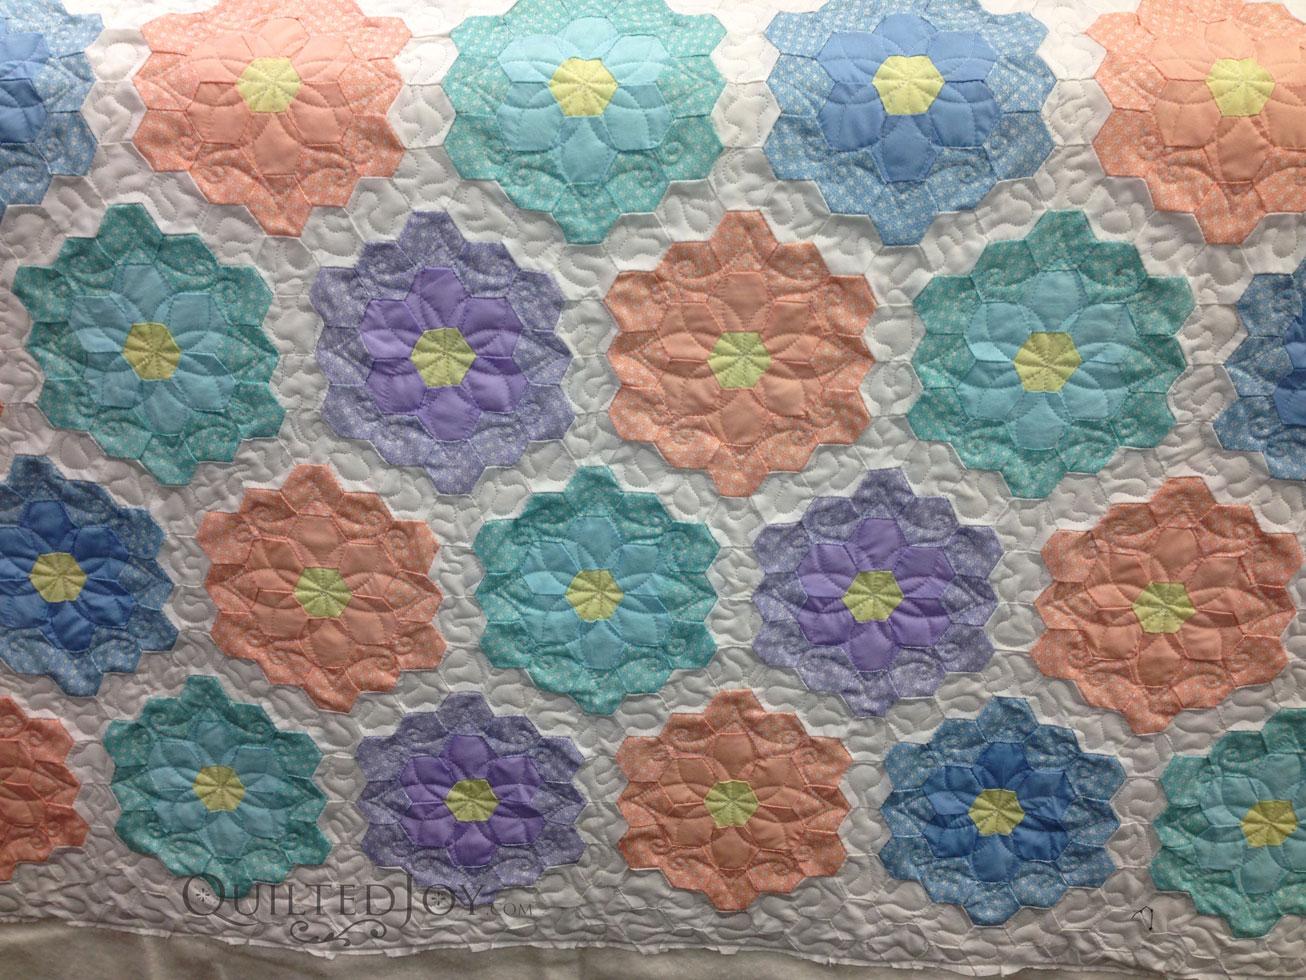 Grandmother 39 s flower garden quilt makeover - Grandmother s flower garden quilt ...